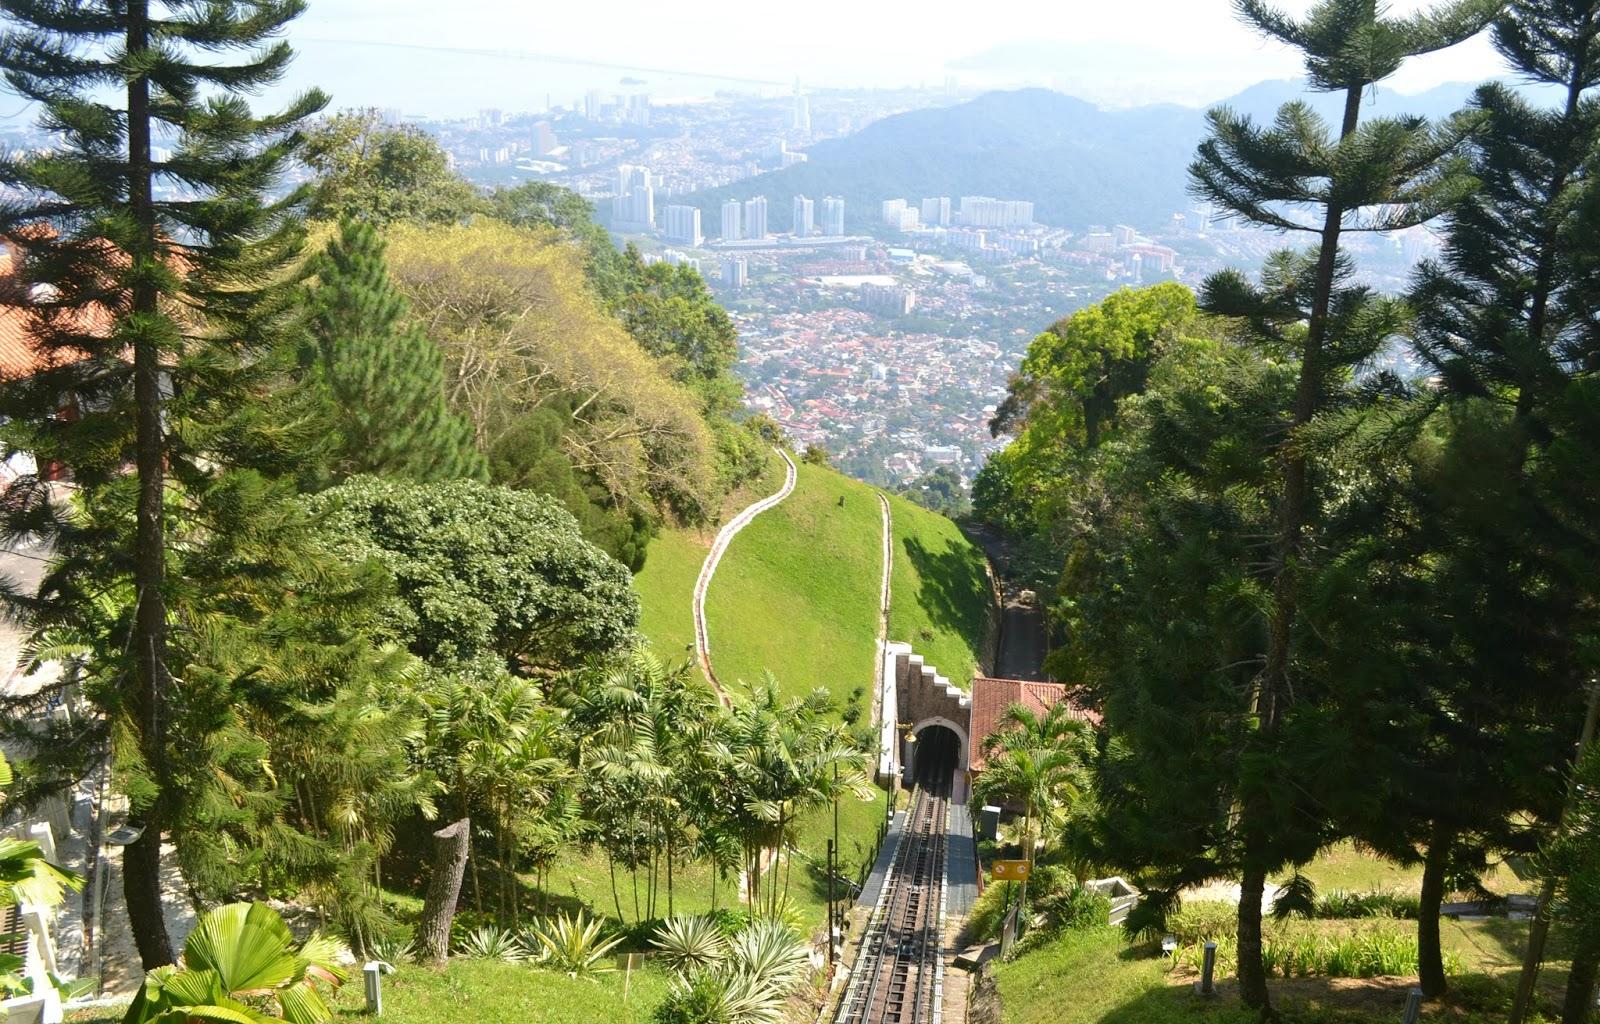 funicular train penang hill malaysia